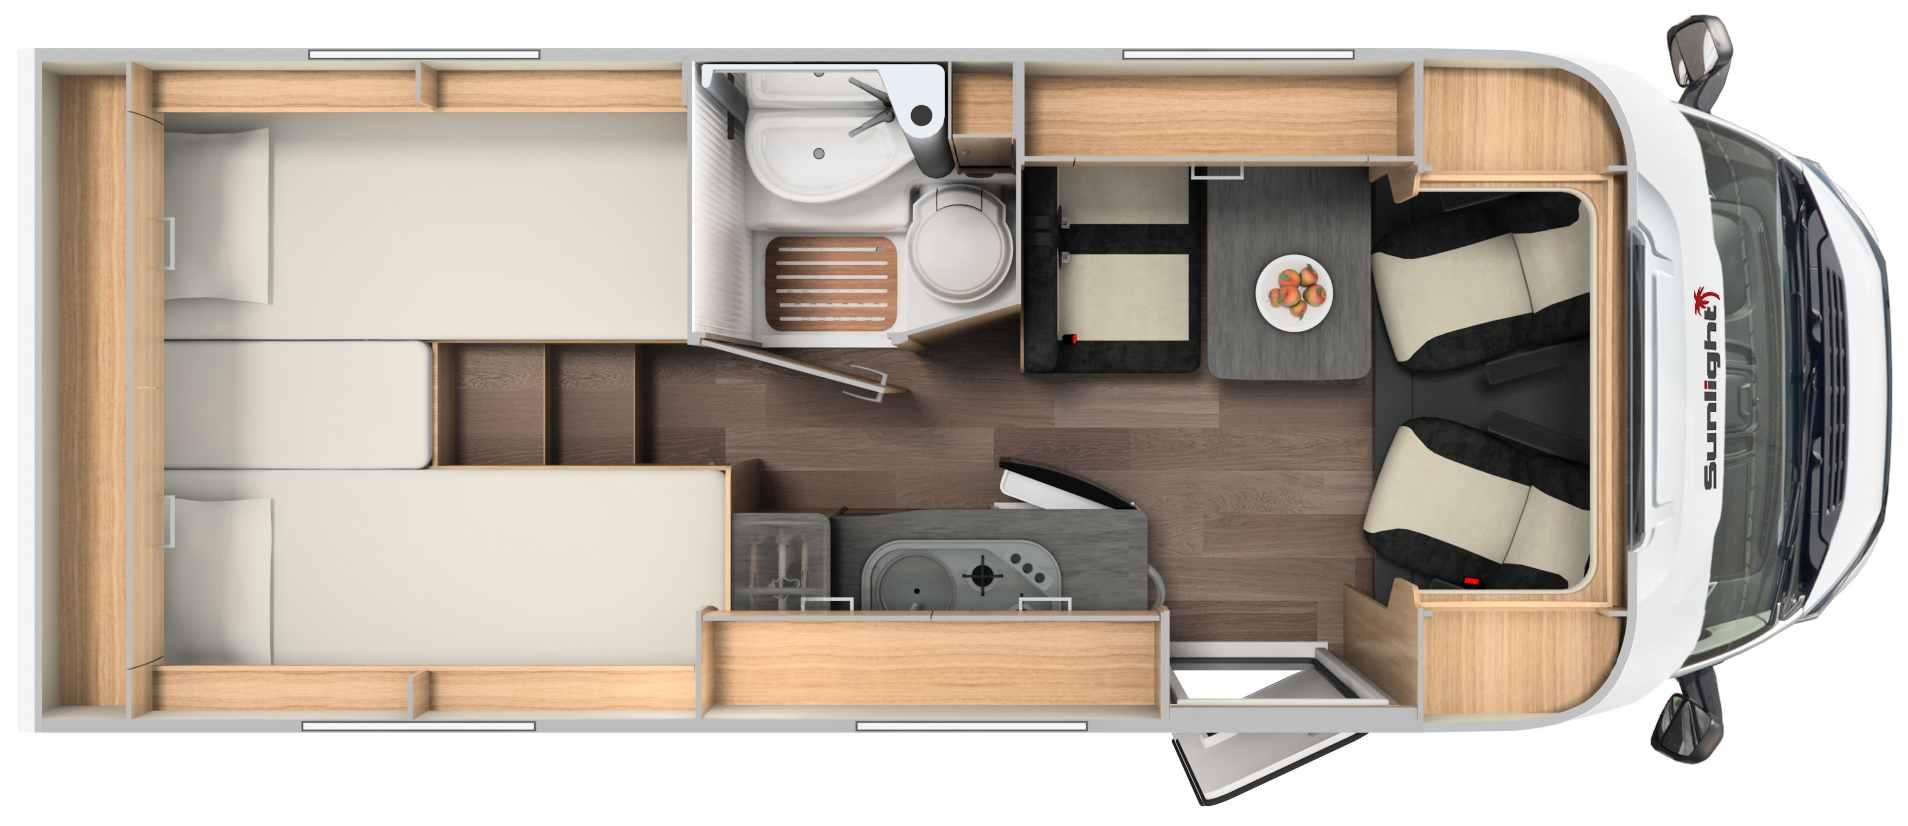 McRent Compact Plus camper